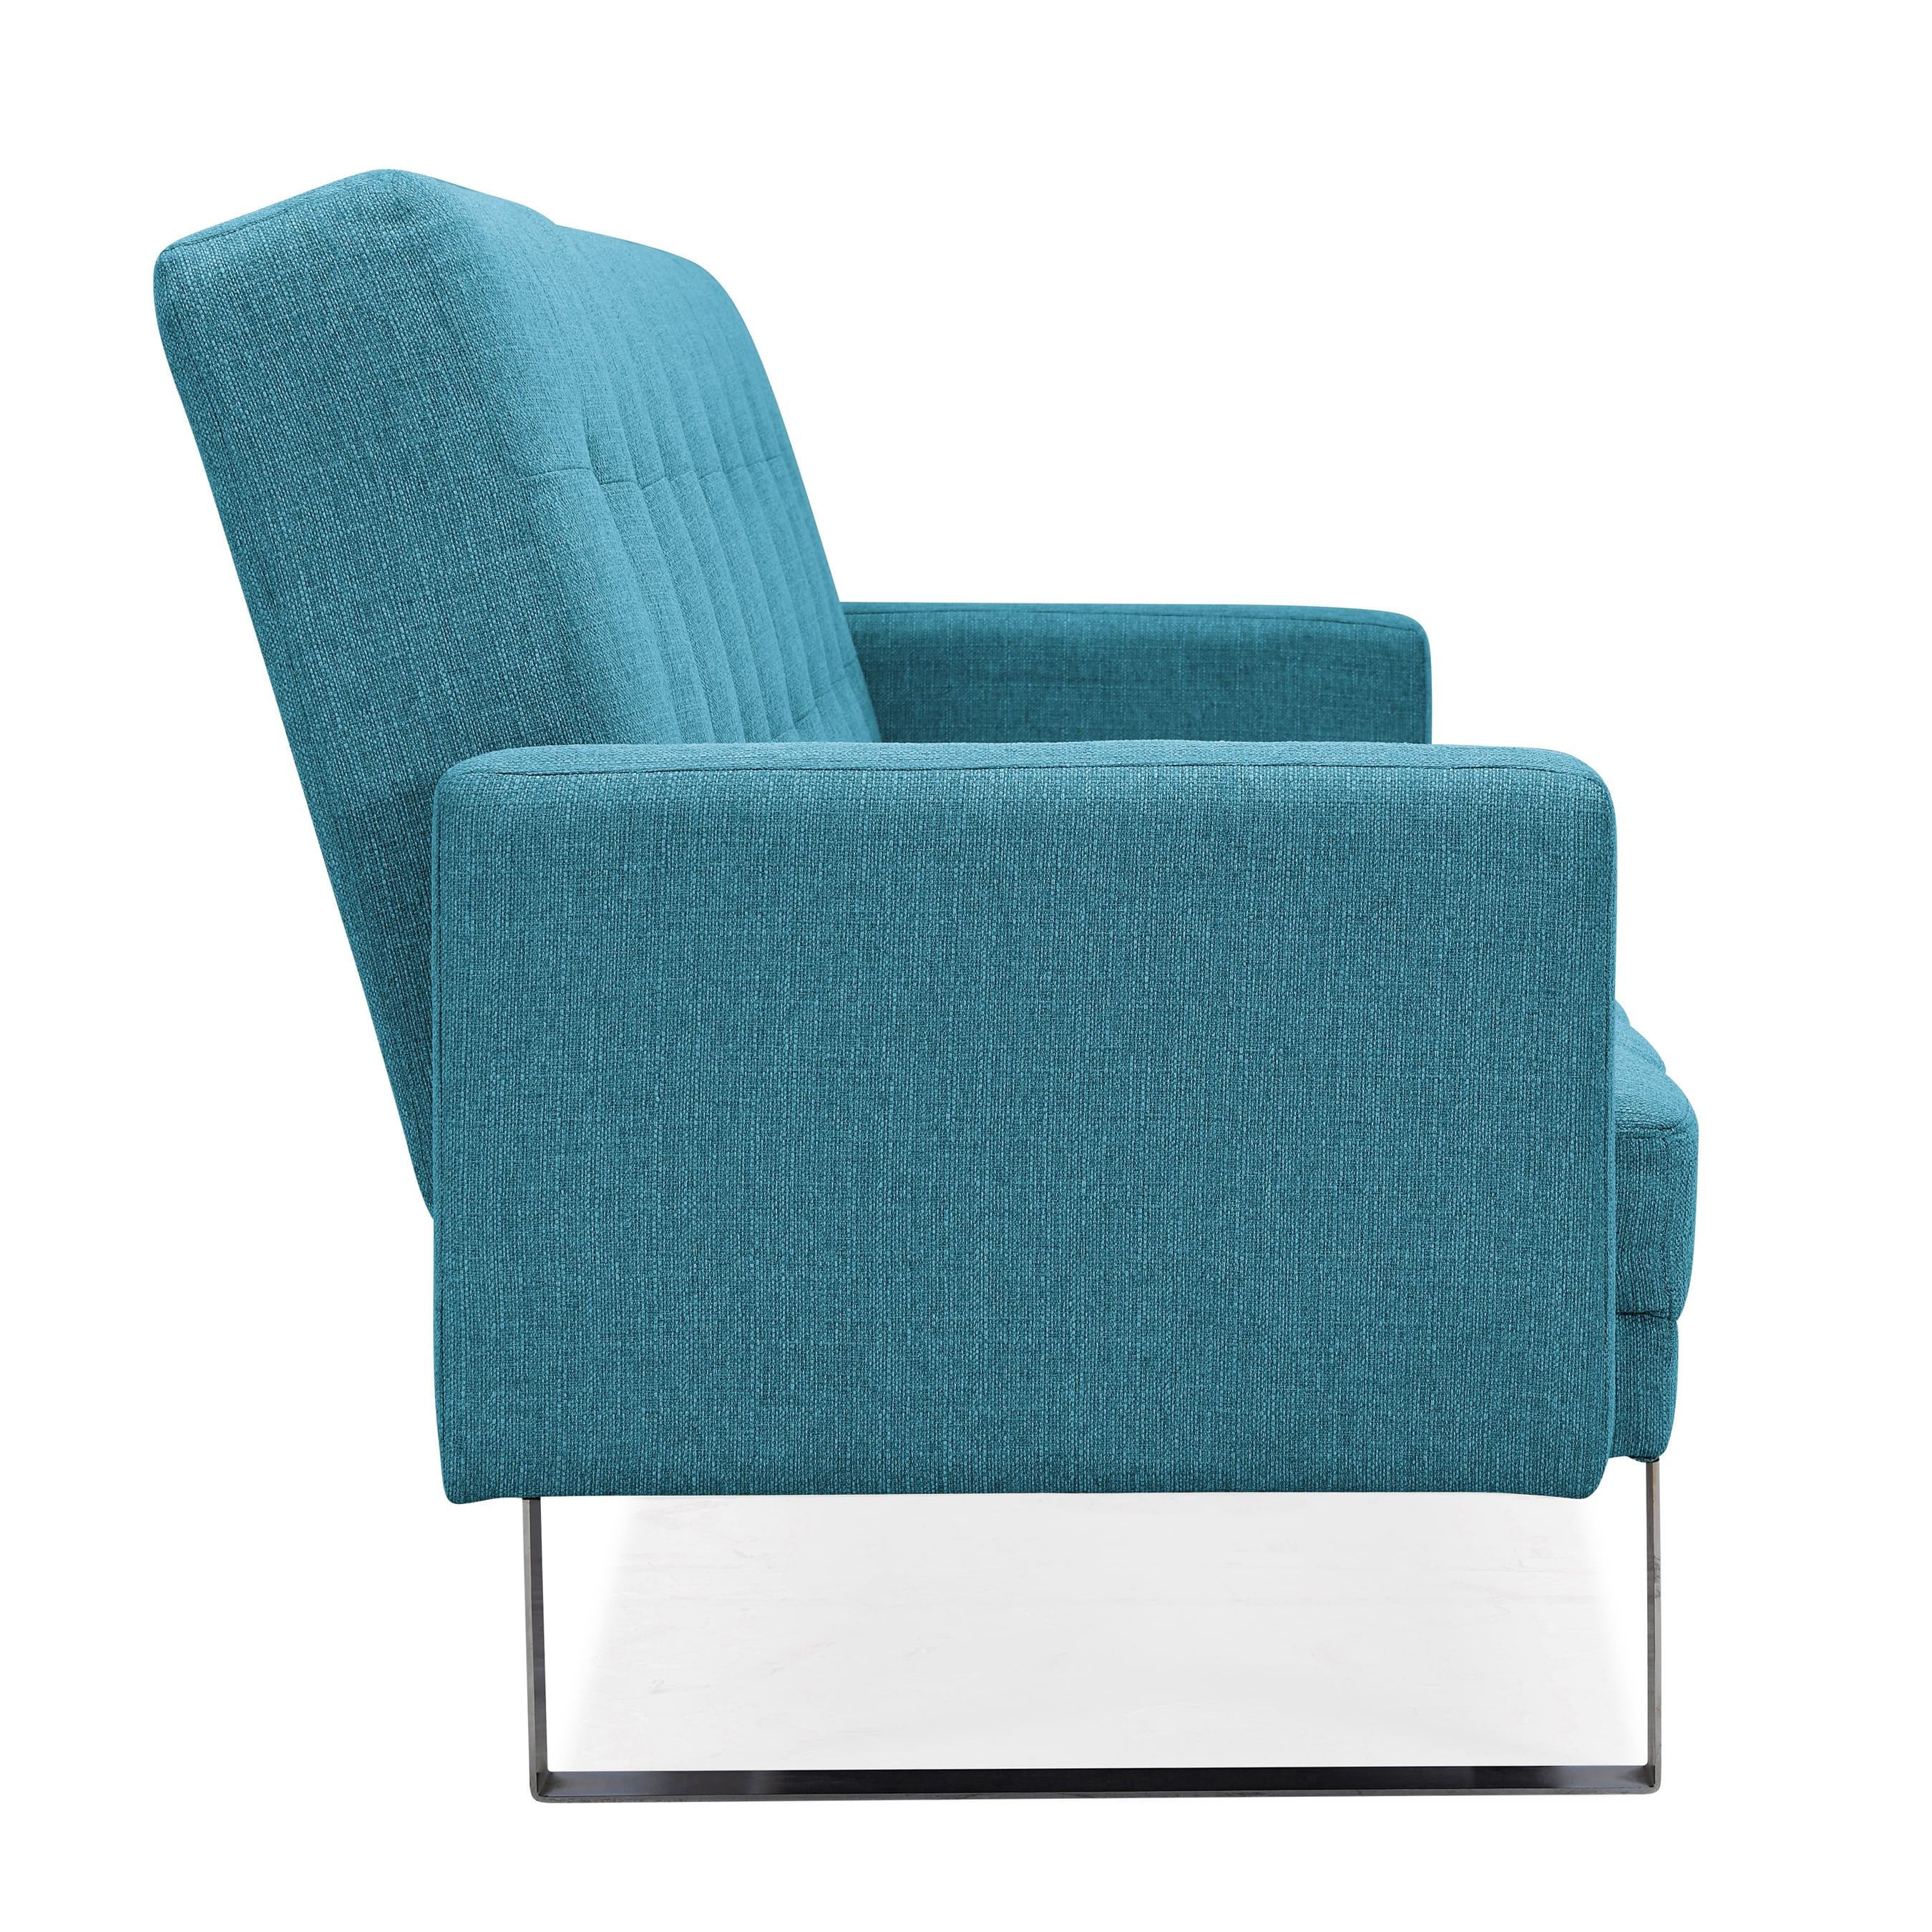 Handy Living Springfield Turquoise Blue Linen Clack Futon